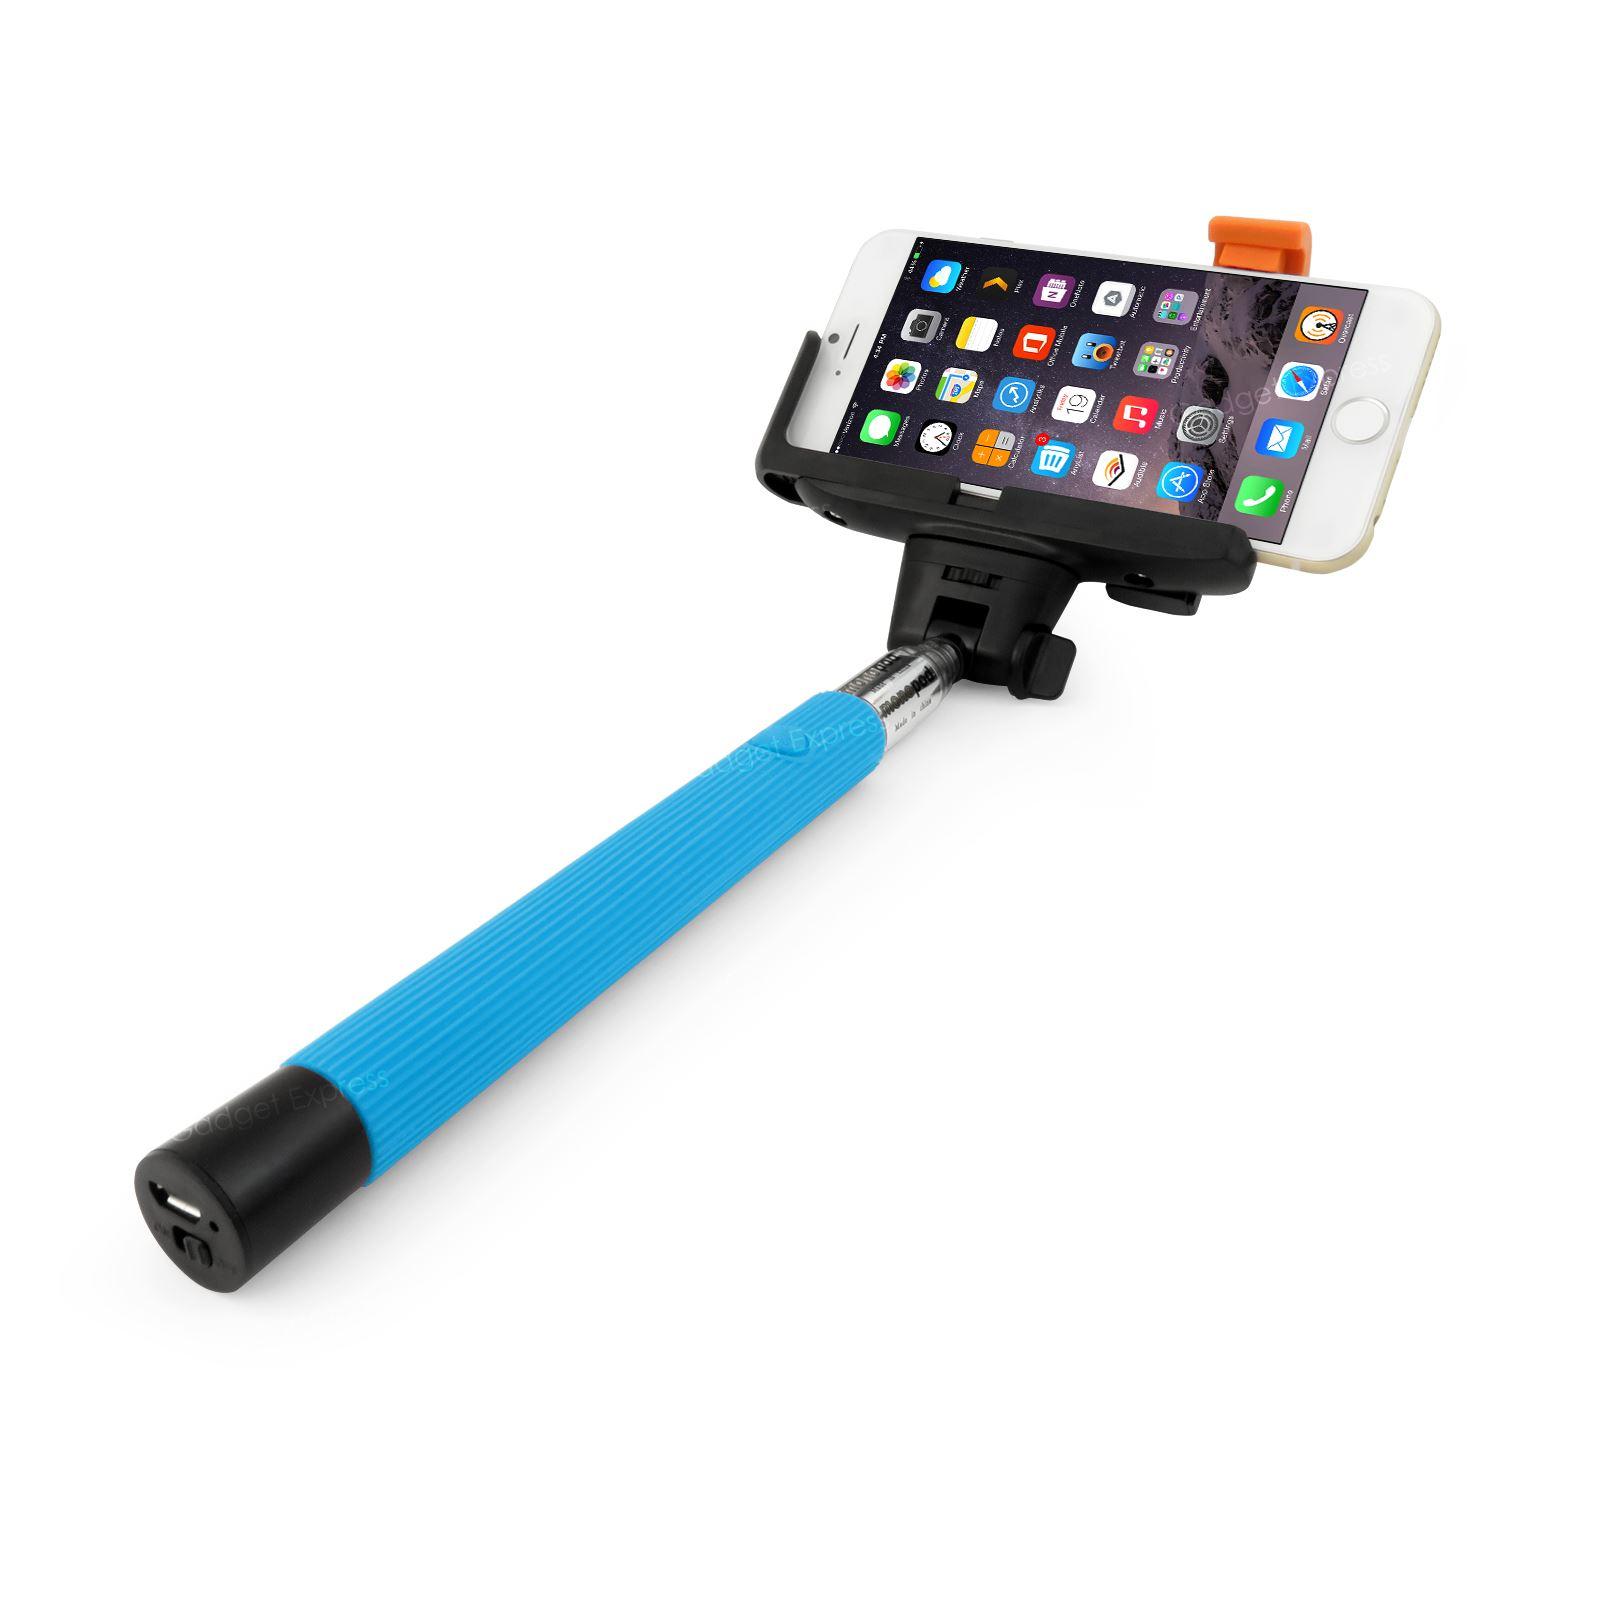 monopod selfie stick wireless telescopic bluetooth remote mobile phone. Black Bedroom Furniture Sets. Home Design Ideas